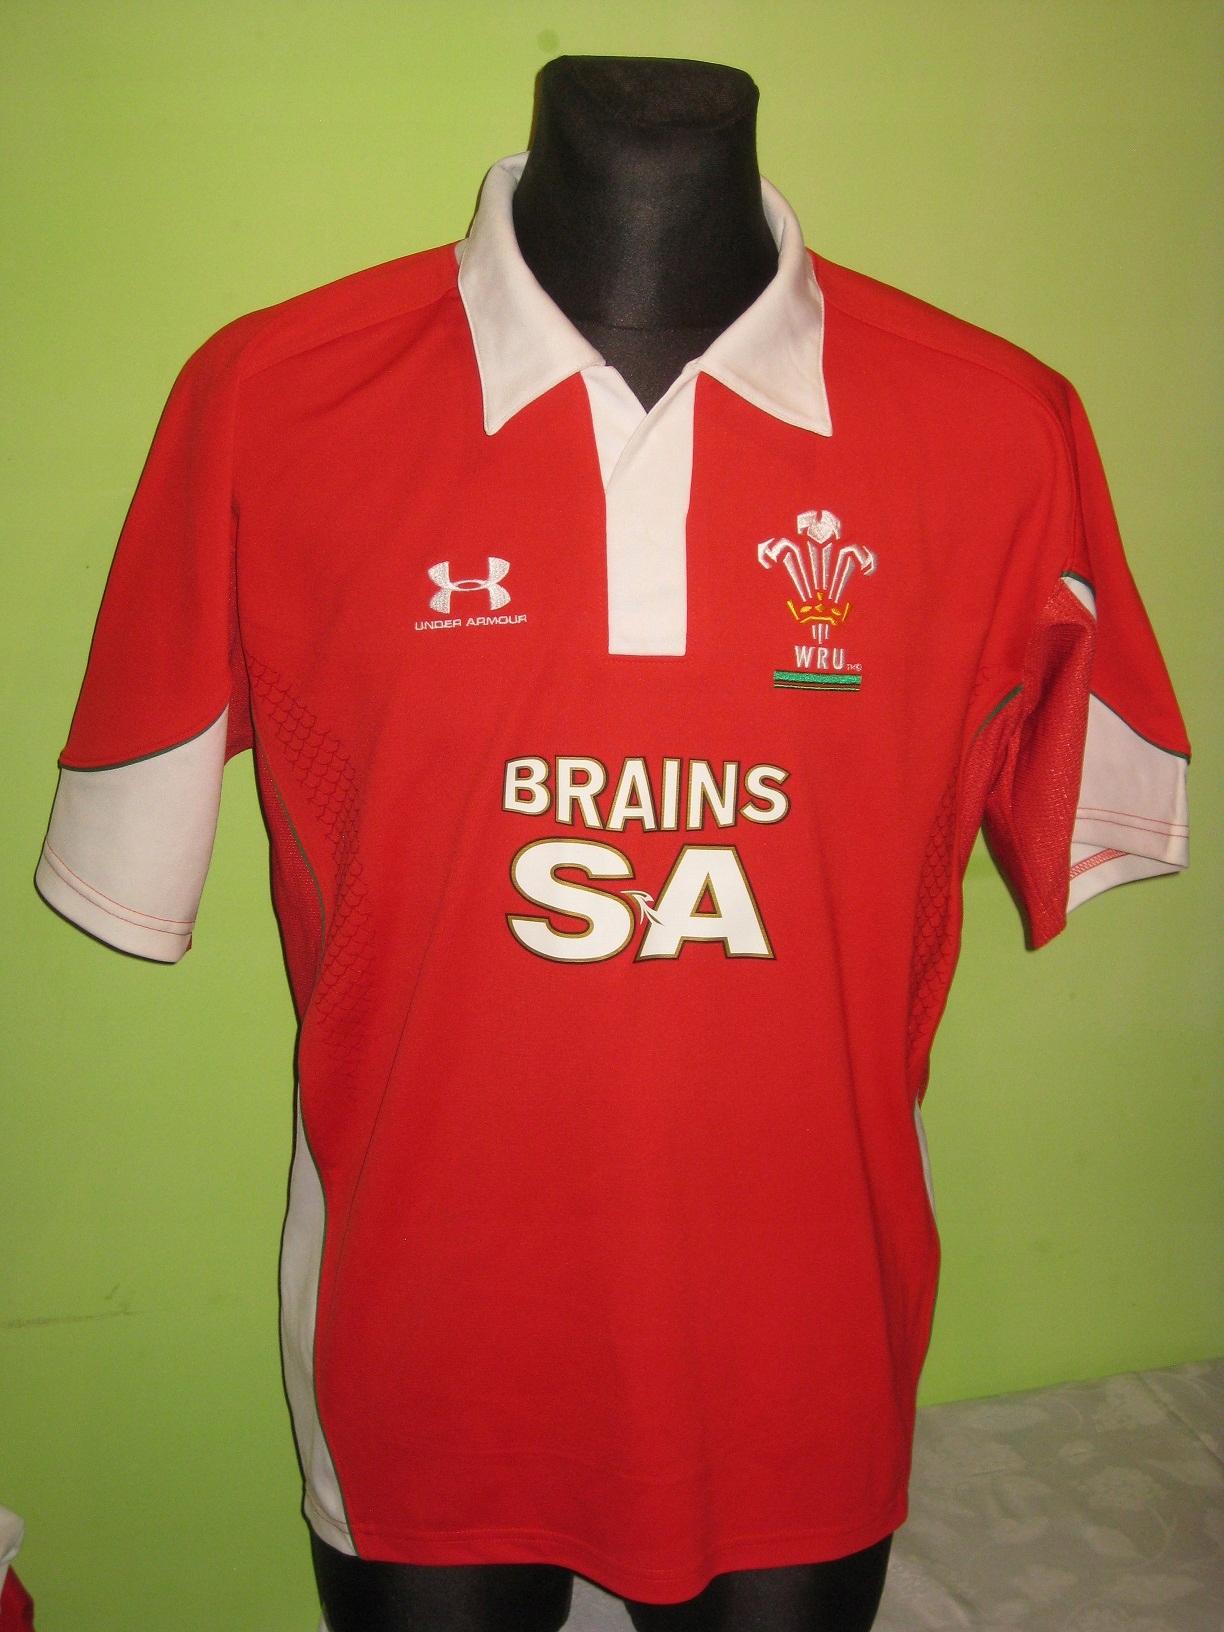 2008-09 WRU Cymru Wales Home Under Armour (L)